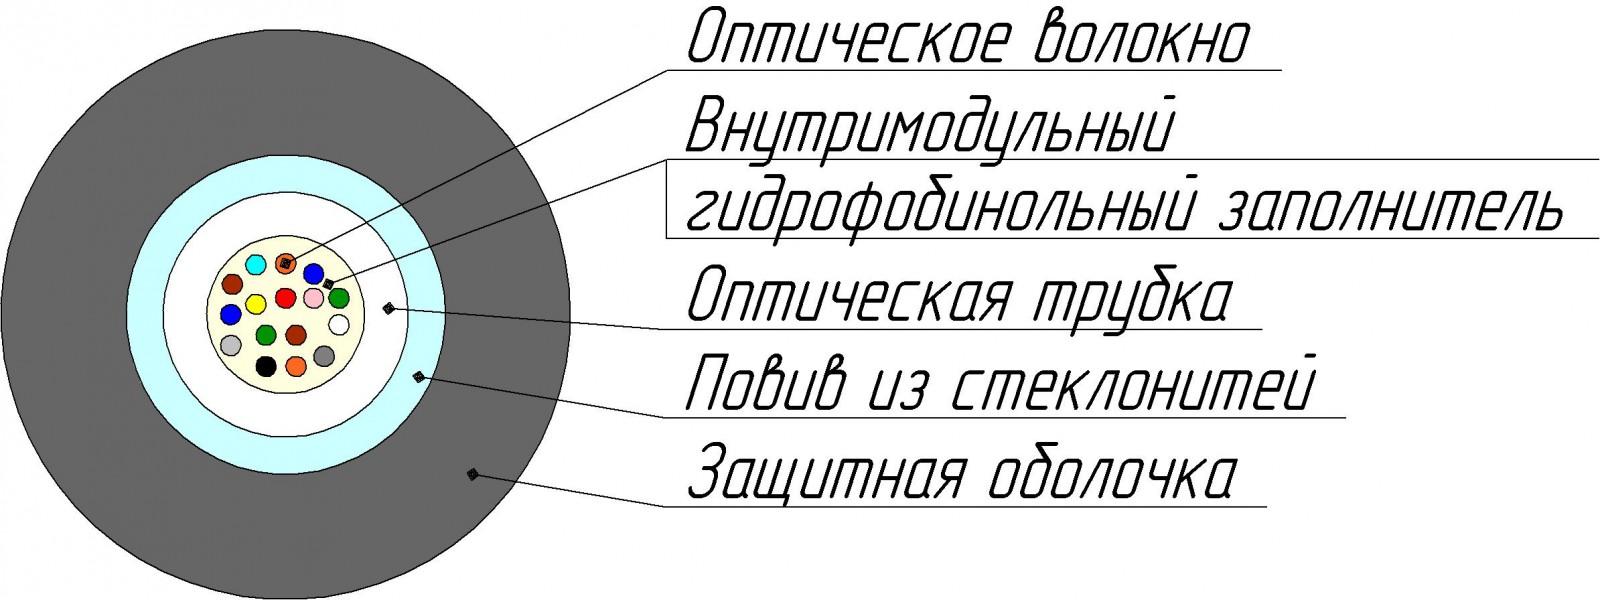 Кабель ОКГ-Т